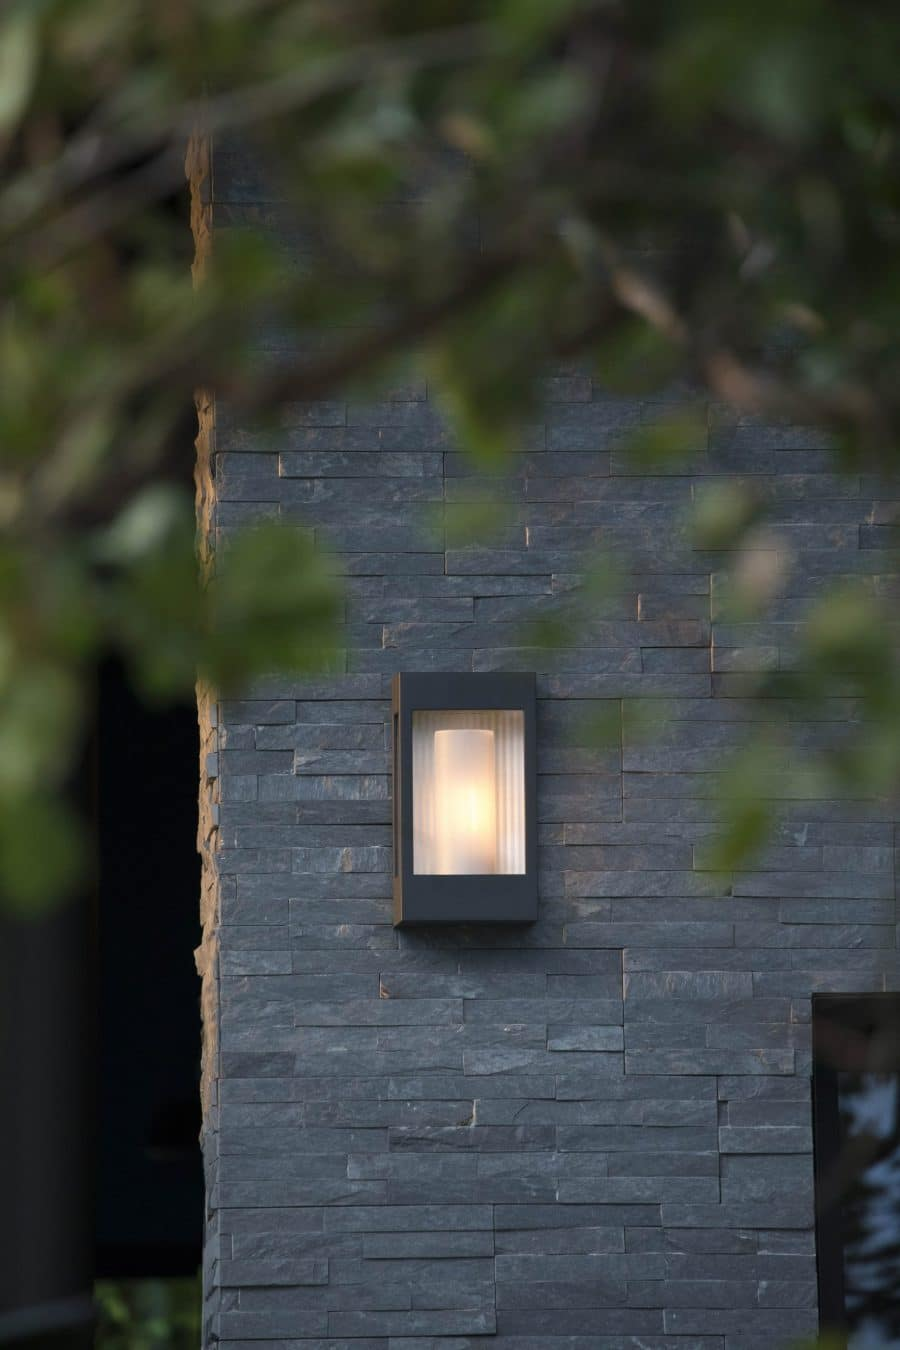 Brick wandlamp roger pradier buitenlamp tuinextra kaatsheuvel